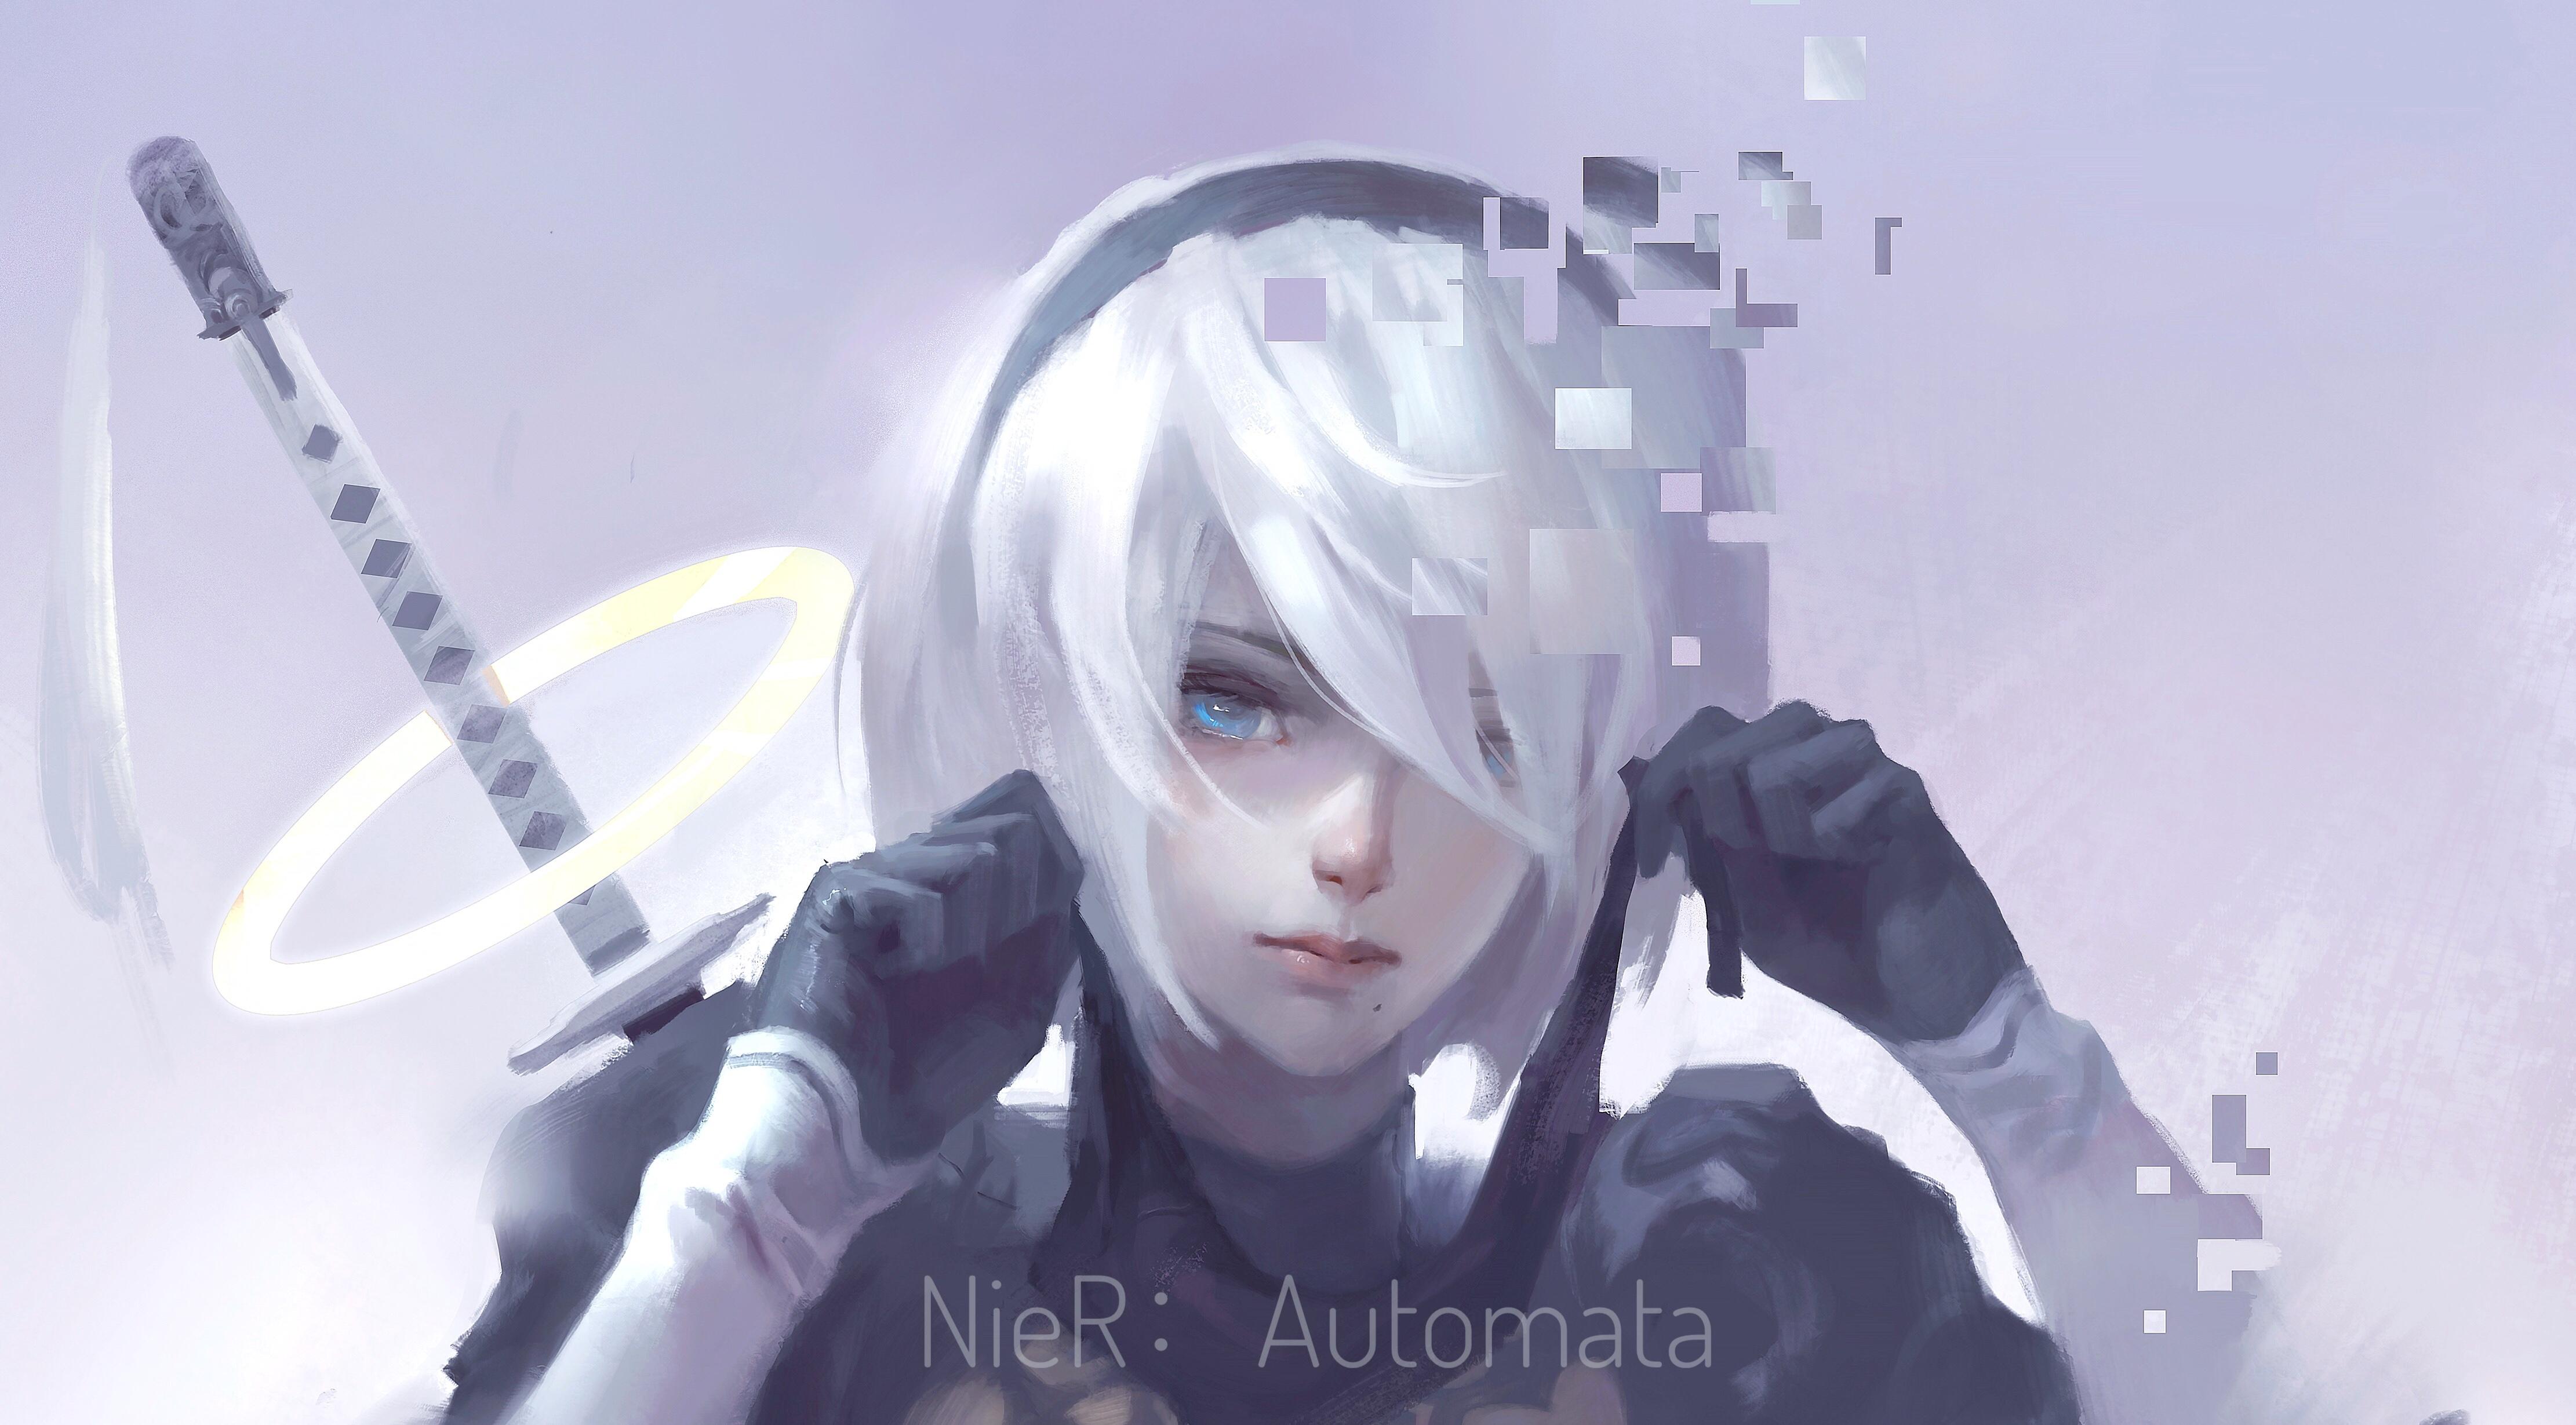 2b Nier Automata Katana Hd 4k Wallpaper: Nier Automata 4k Artworks, HD Anime, 4k Wallpapers, Images